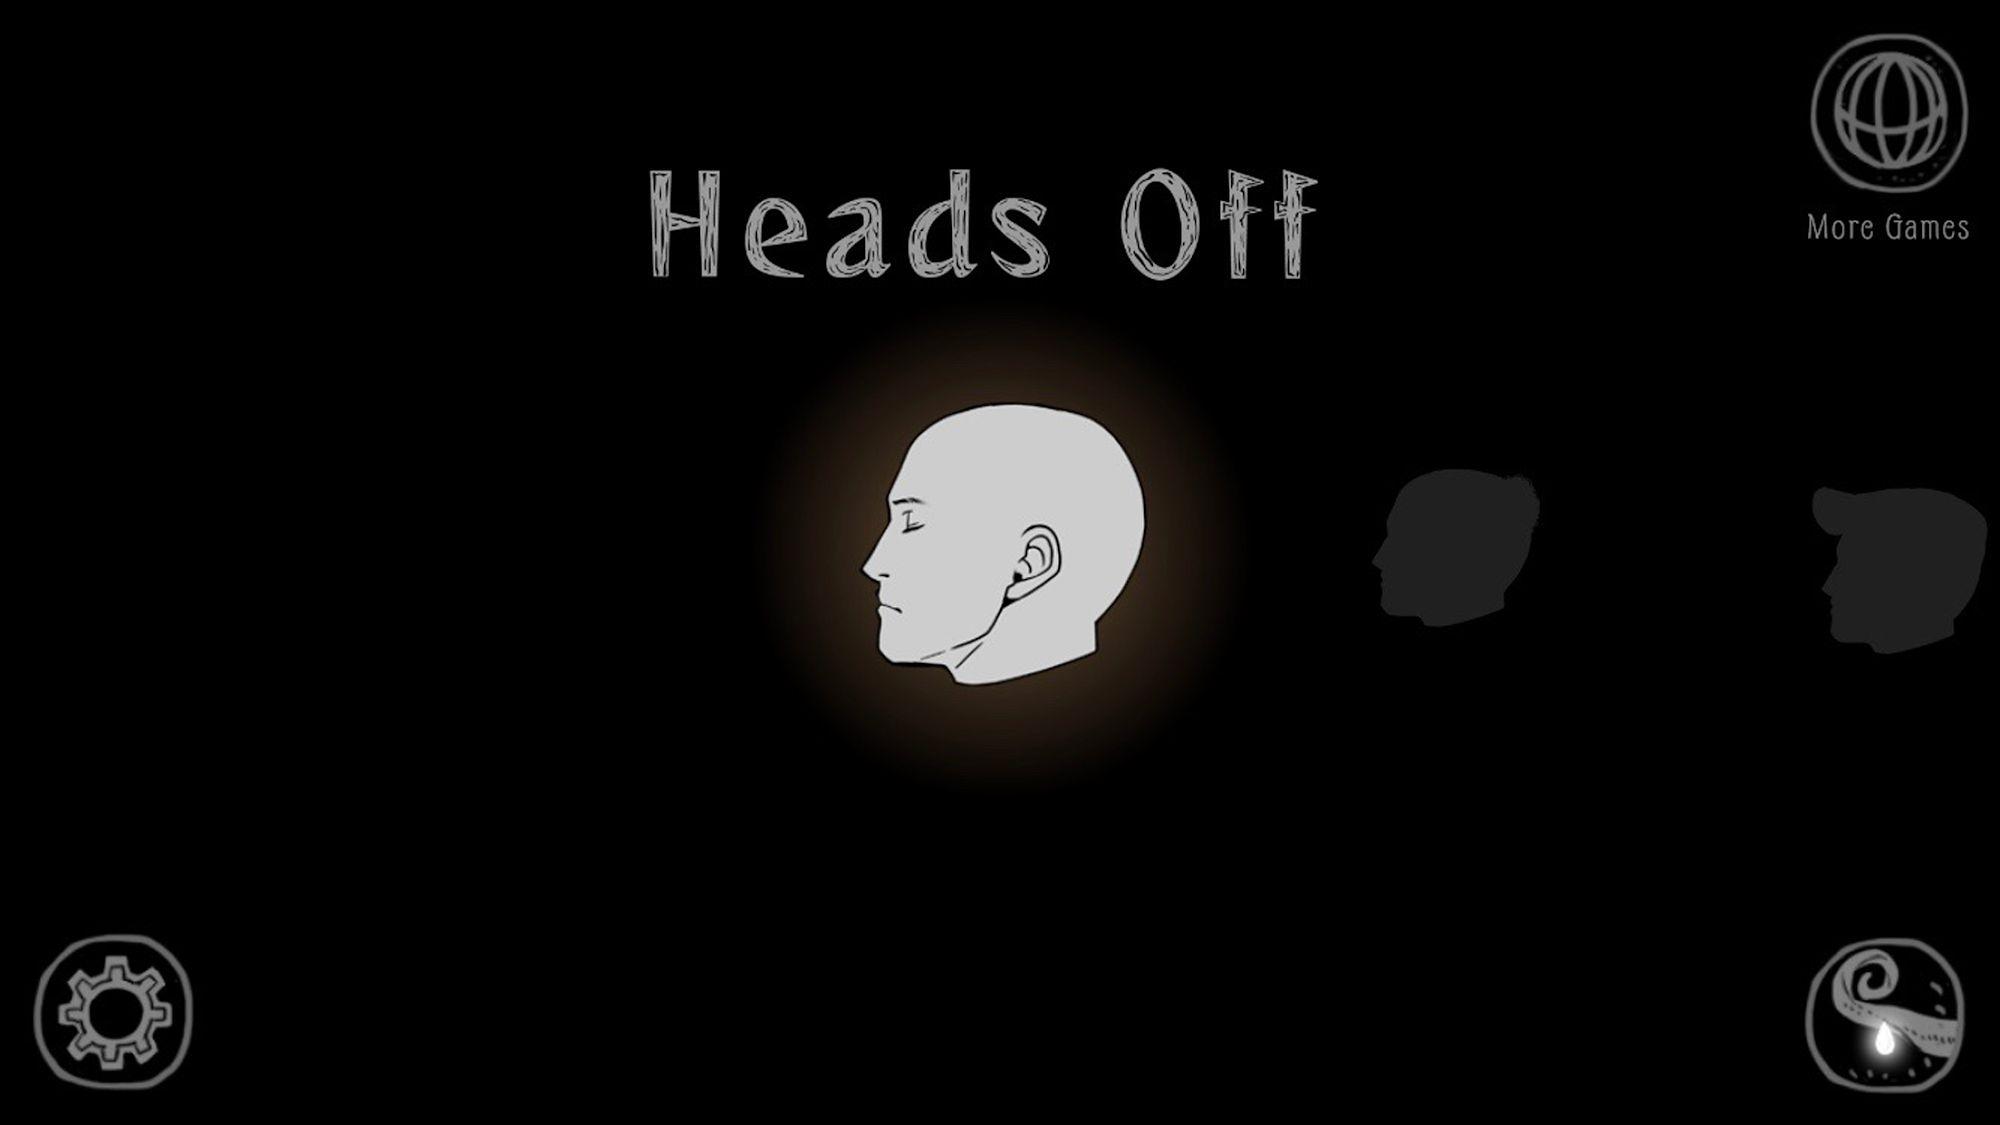 Heads Off スクリーンショット1